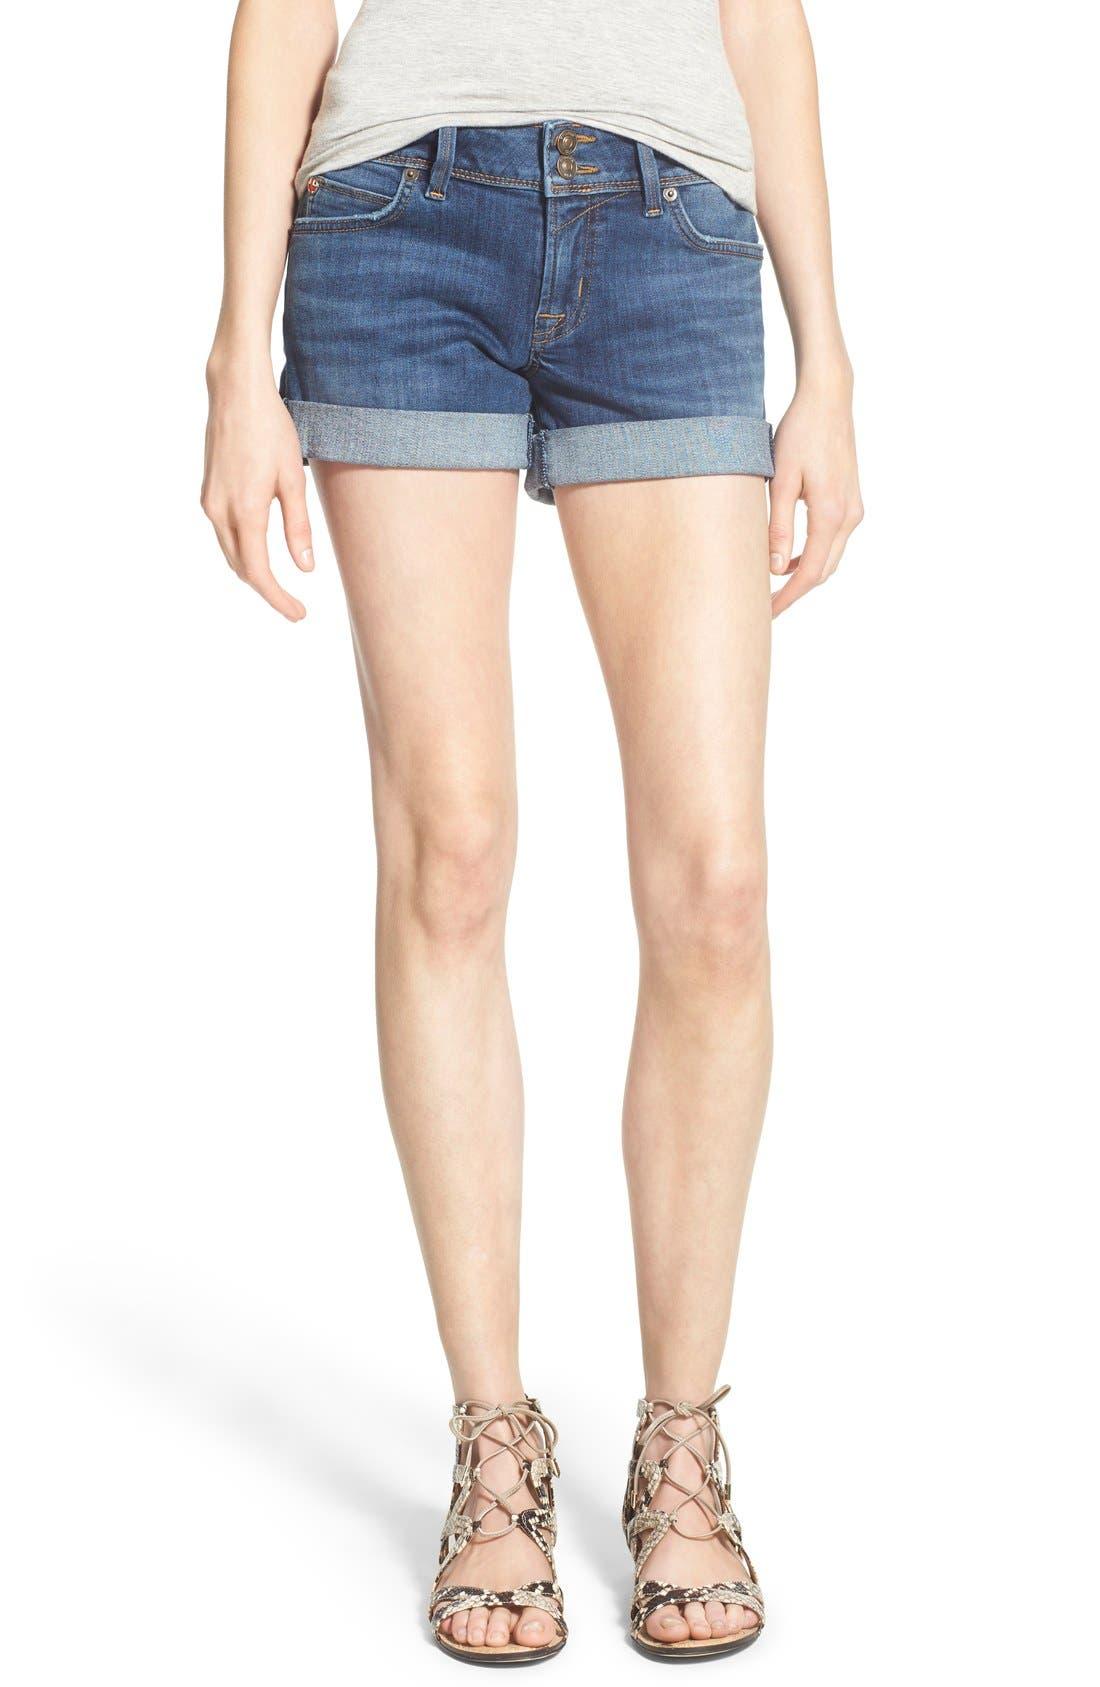 HUDSON JEANS 'Croxley' Cuffed Denim Shorts